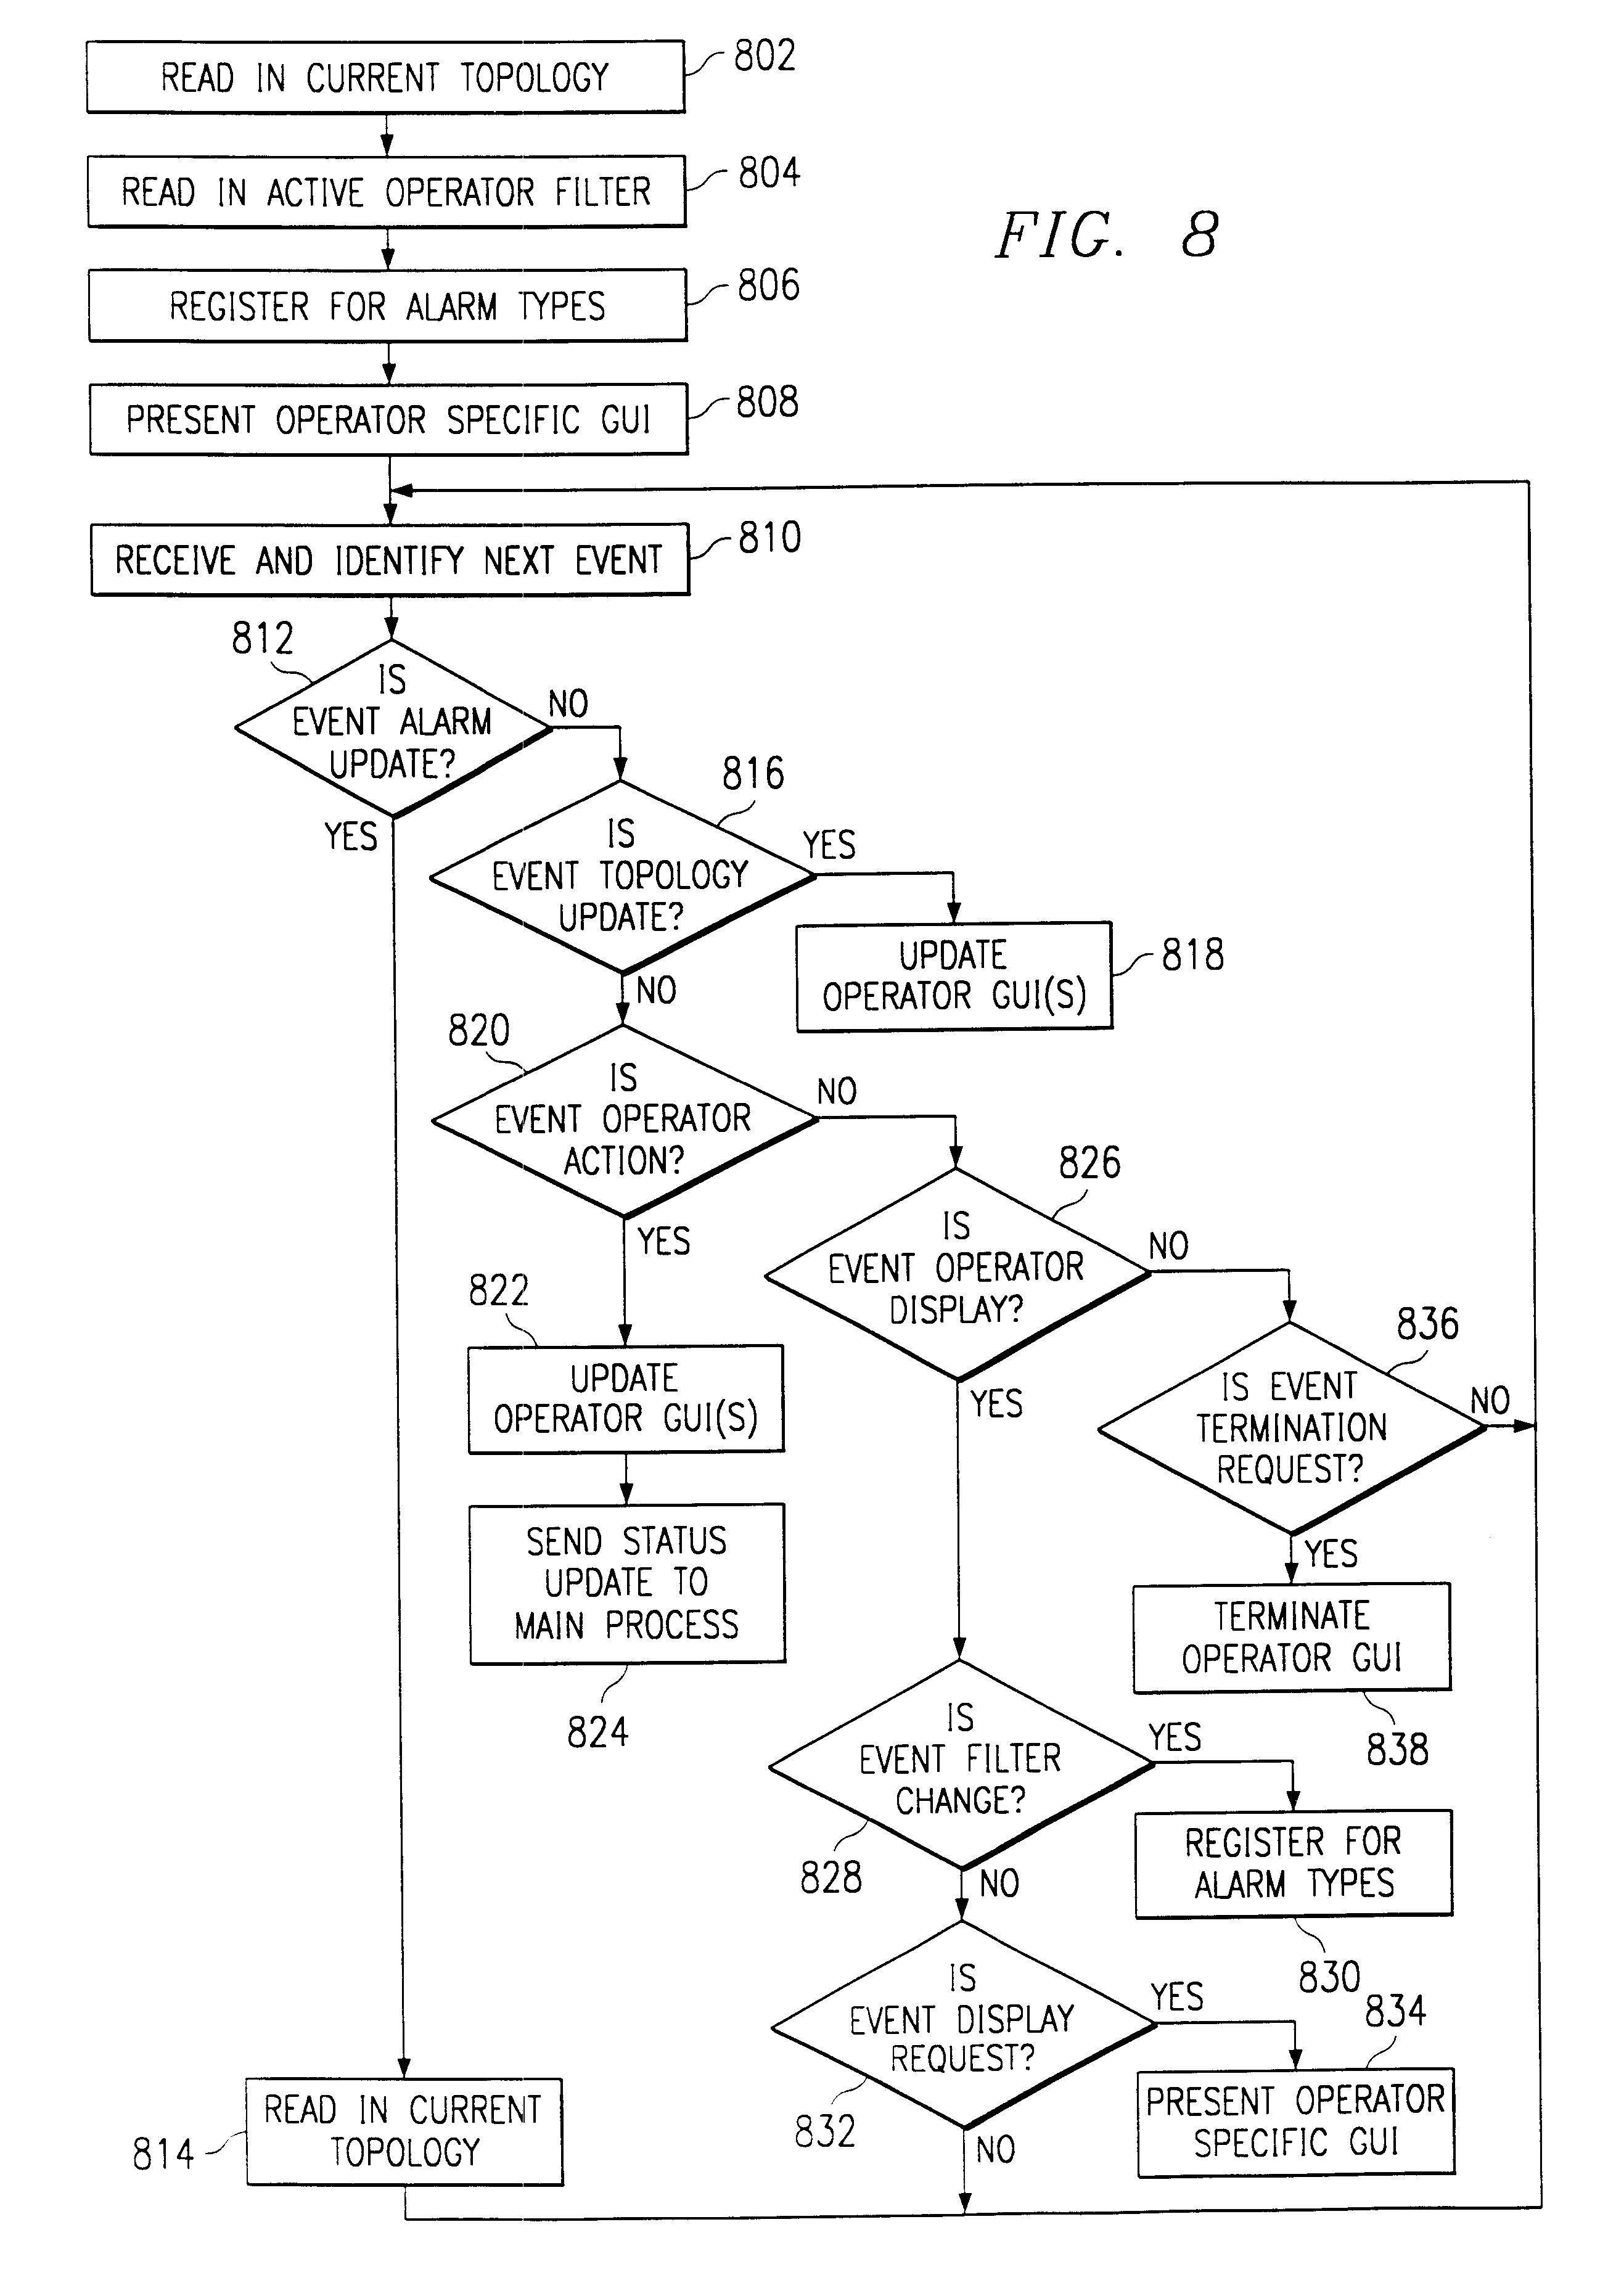 Patent US 6,754,181 B1